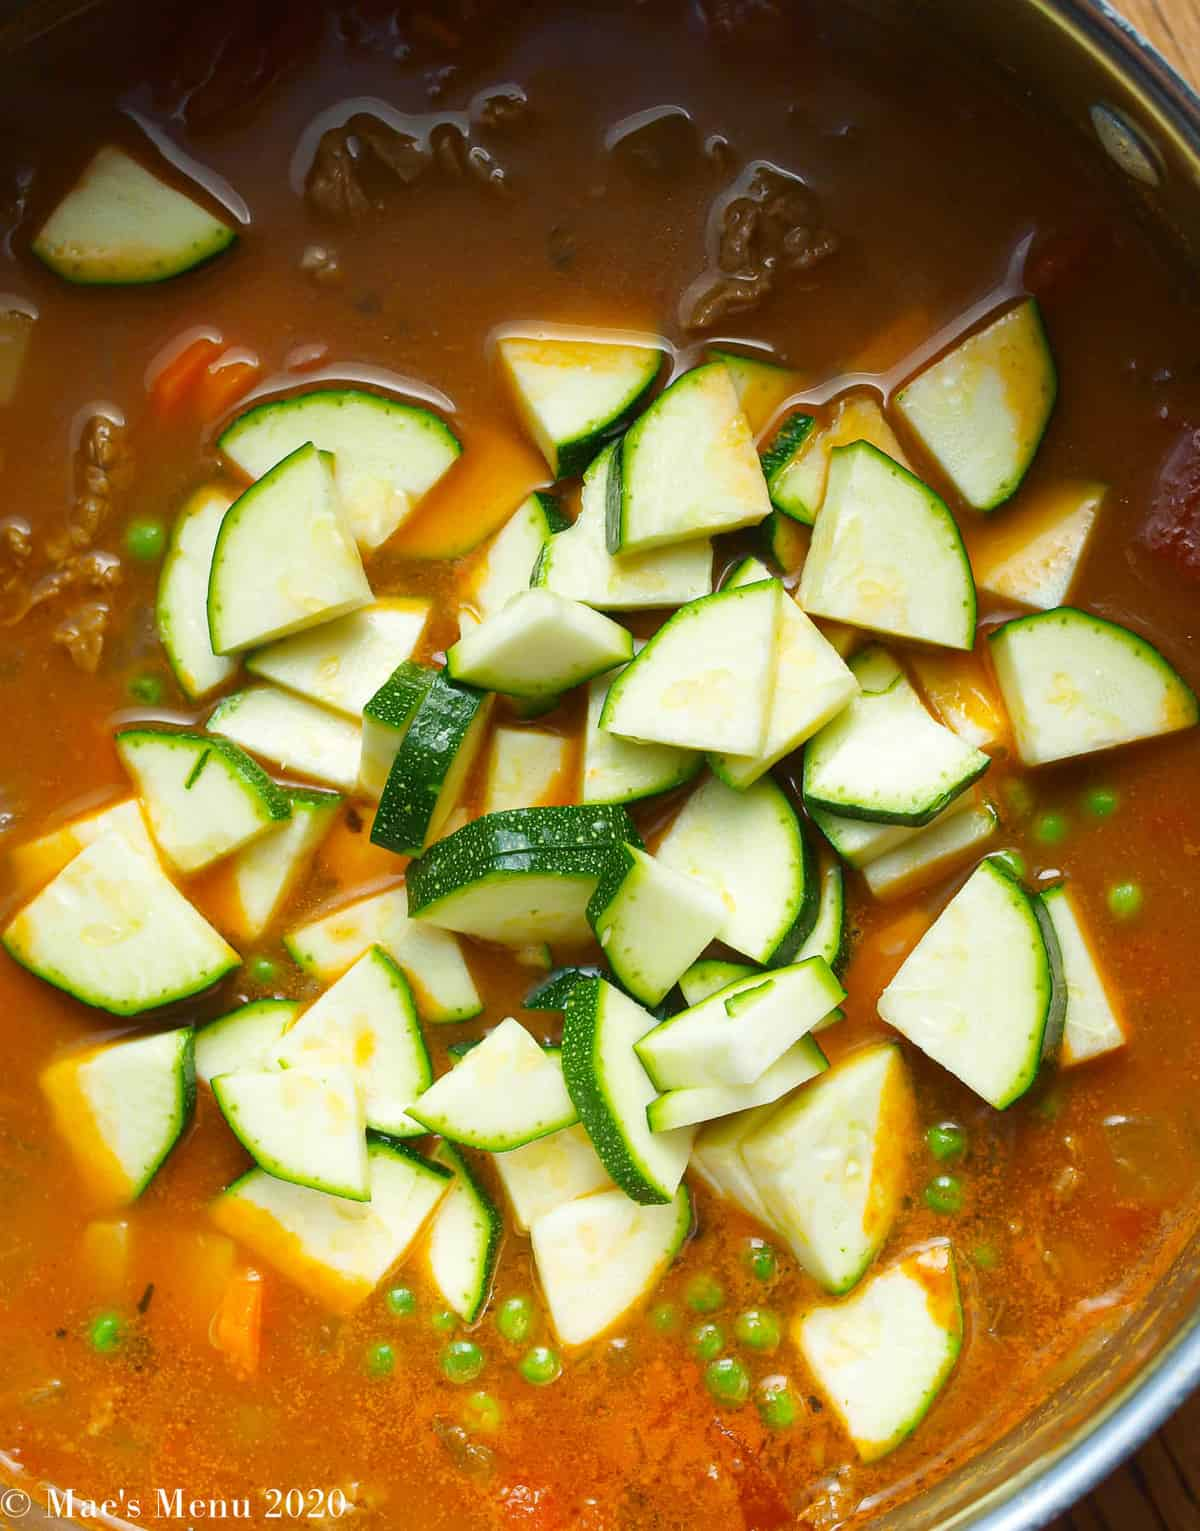 Adding zucchini to the pot